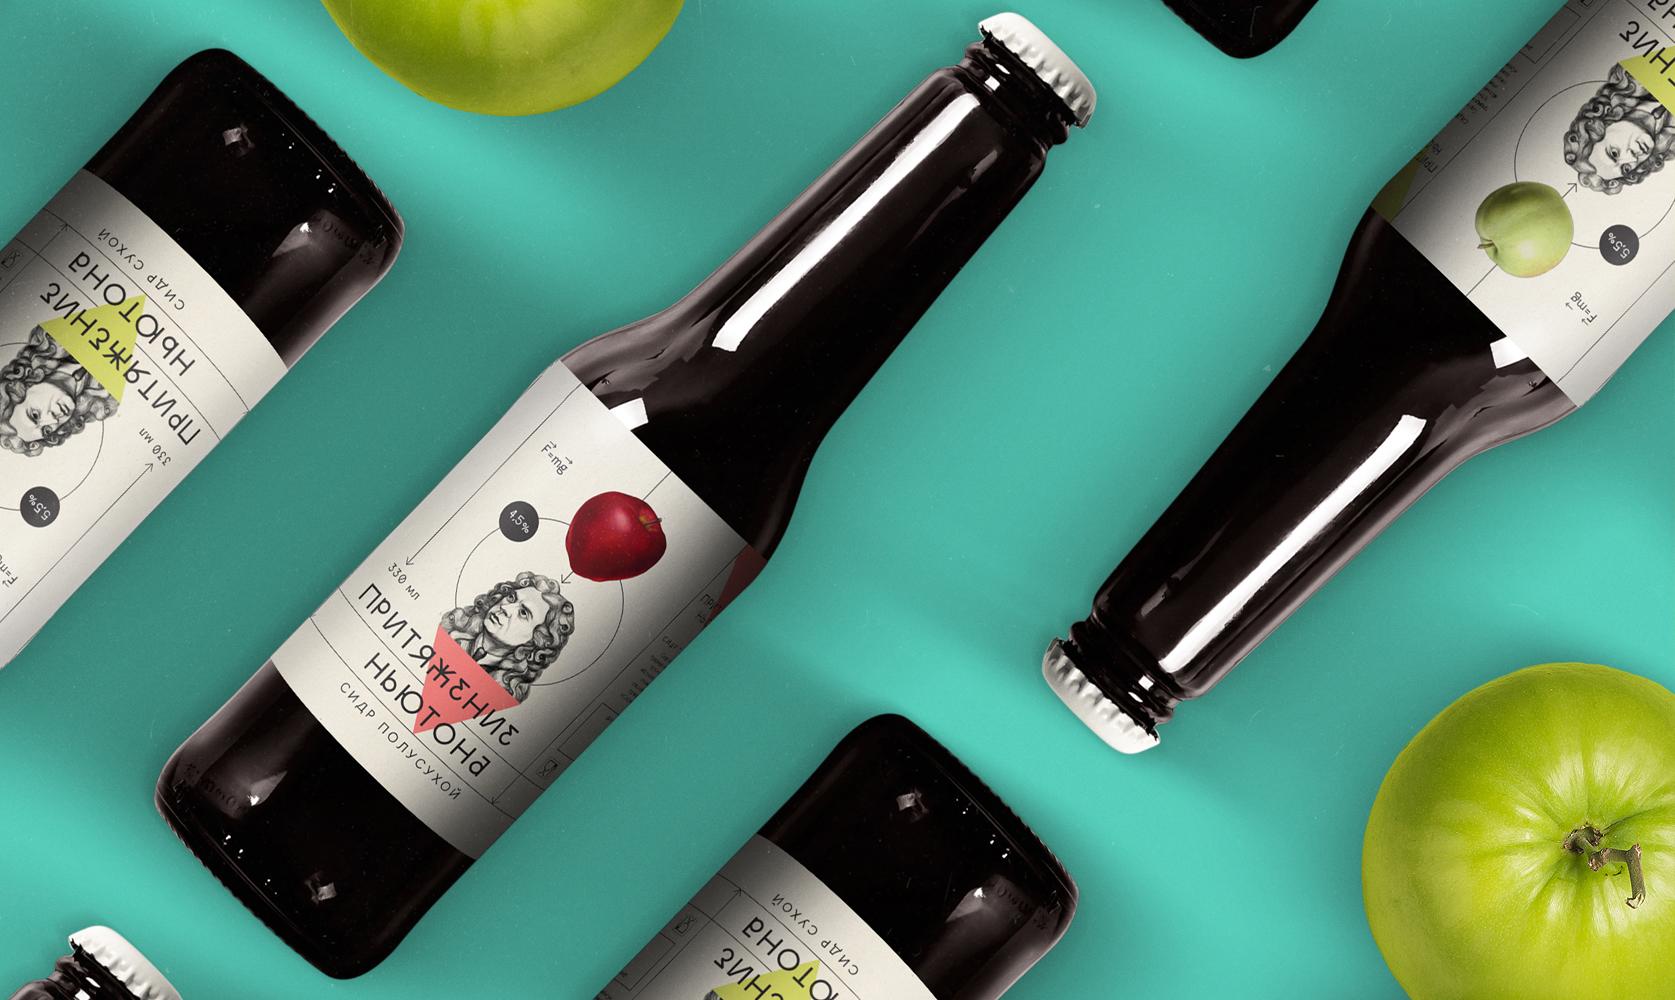 GreenMars Creative Agency Packaging Design for Cider Newton's Gravity